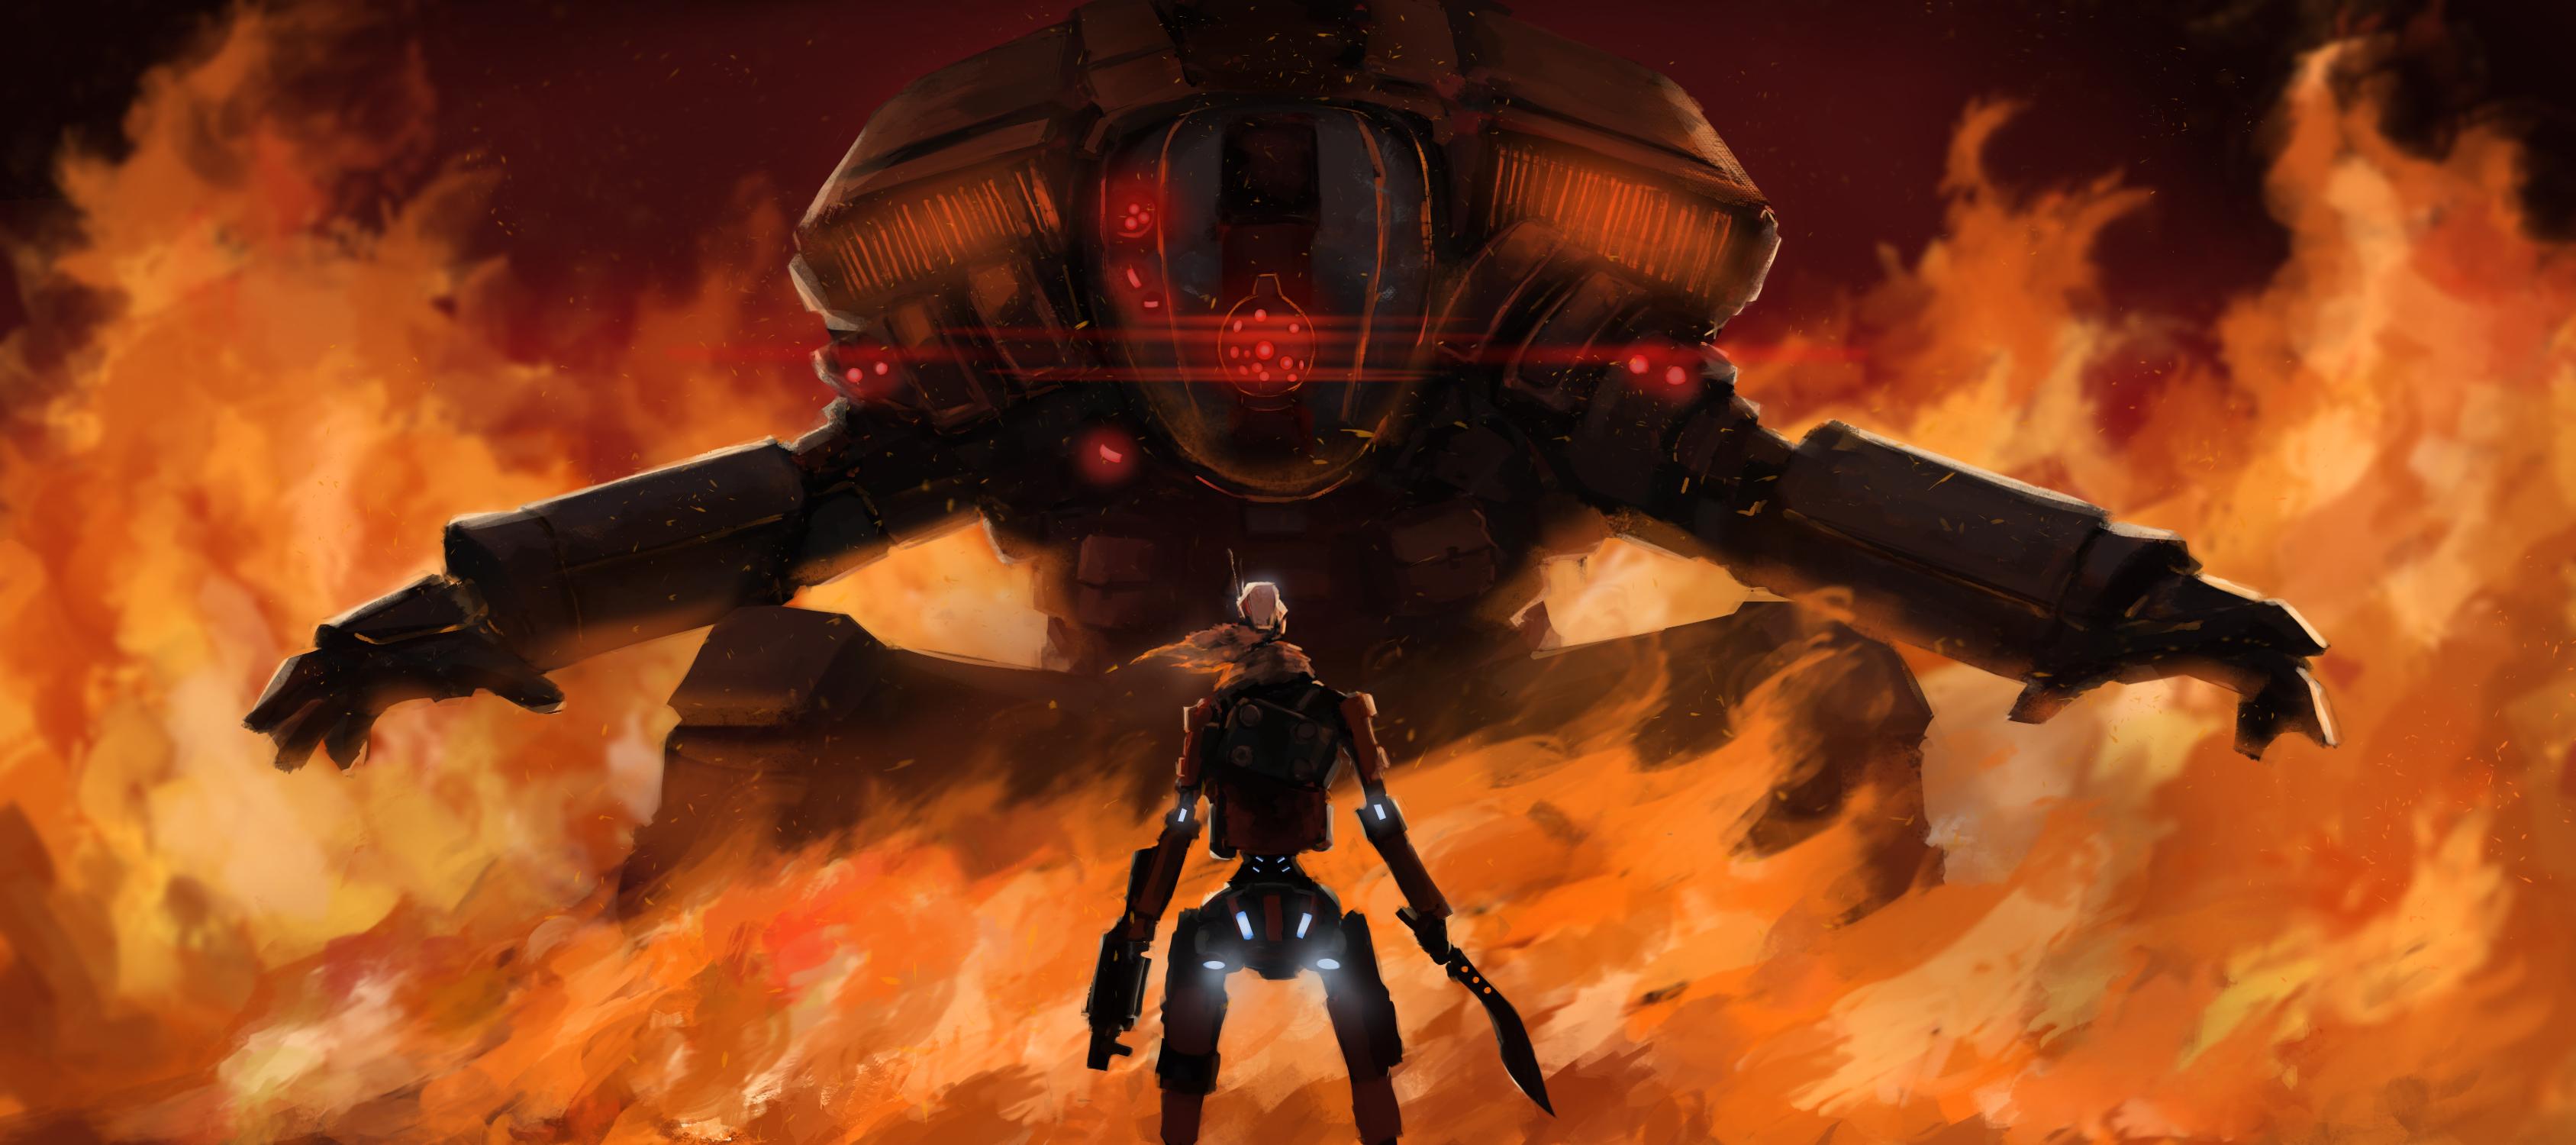 Titanfall 2 Digital Art, HD Games, 4k Wallpapers, Images ...